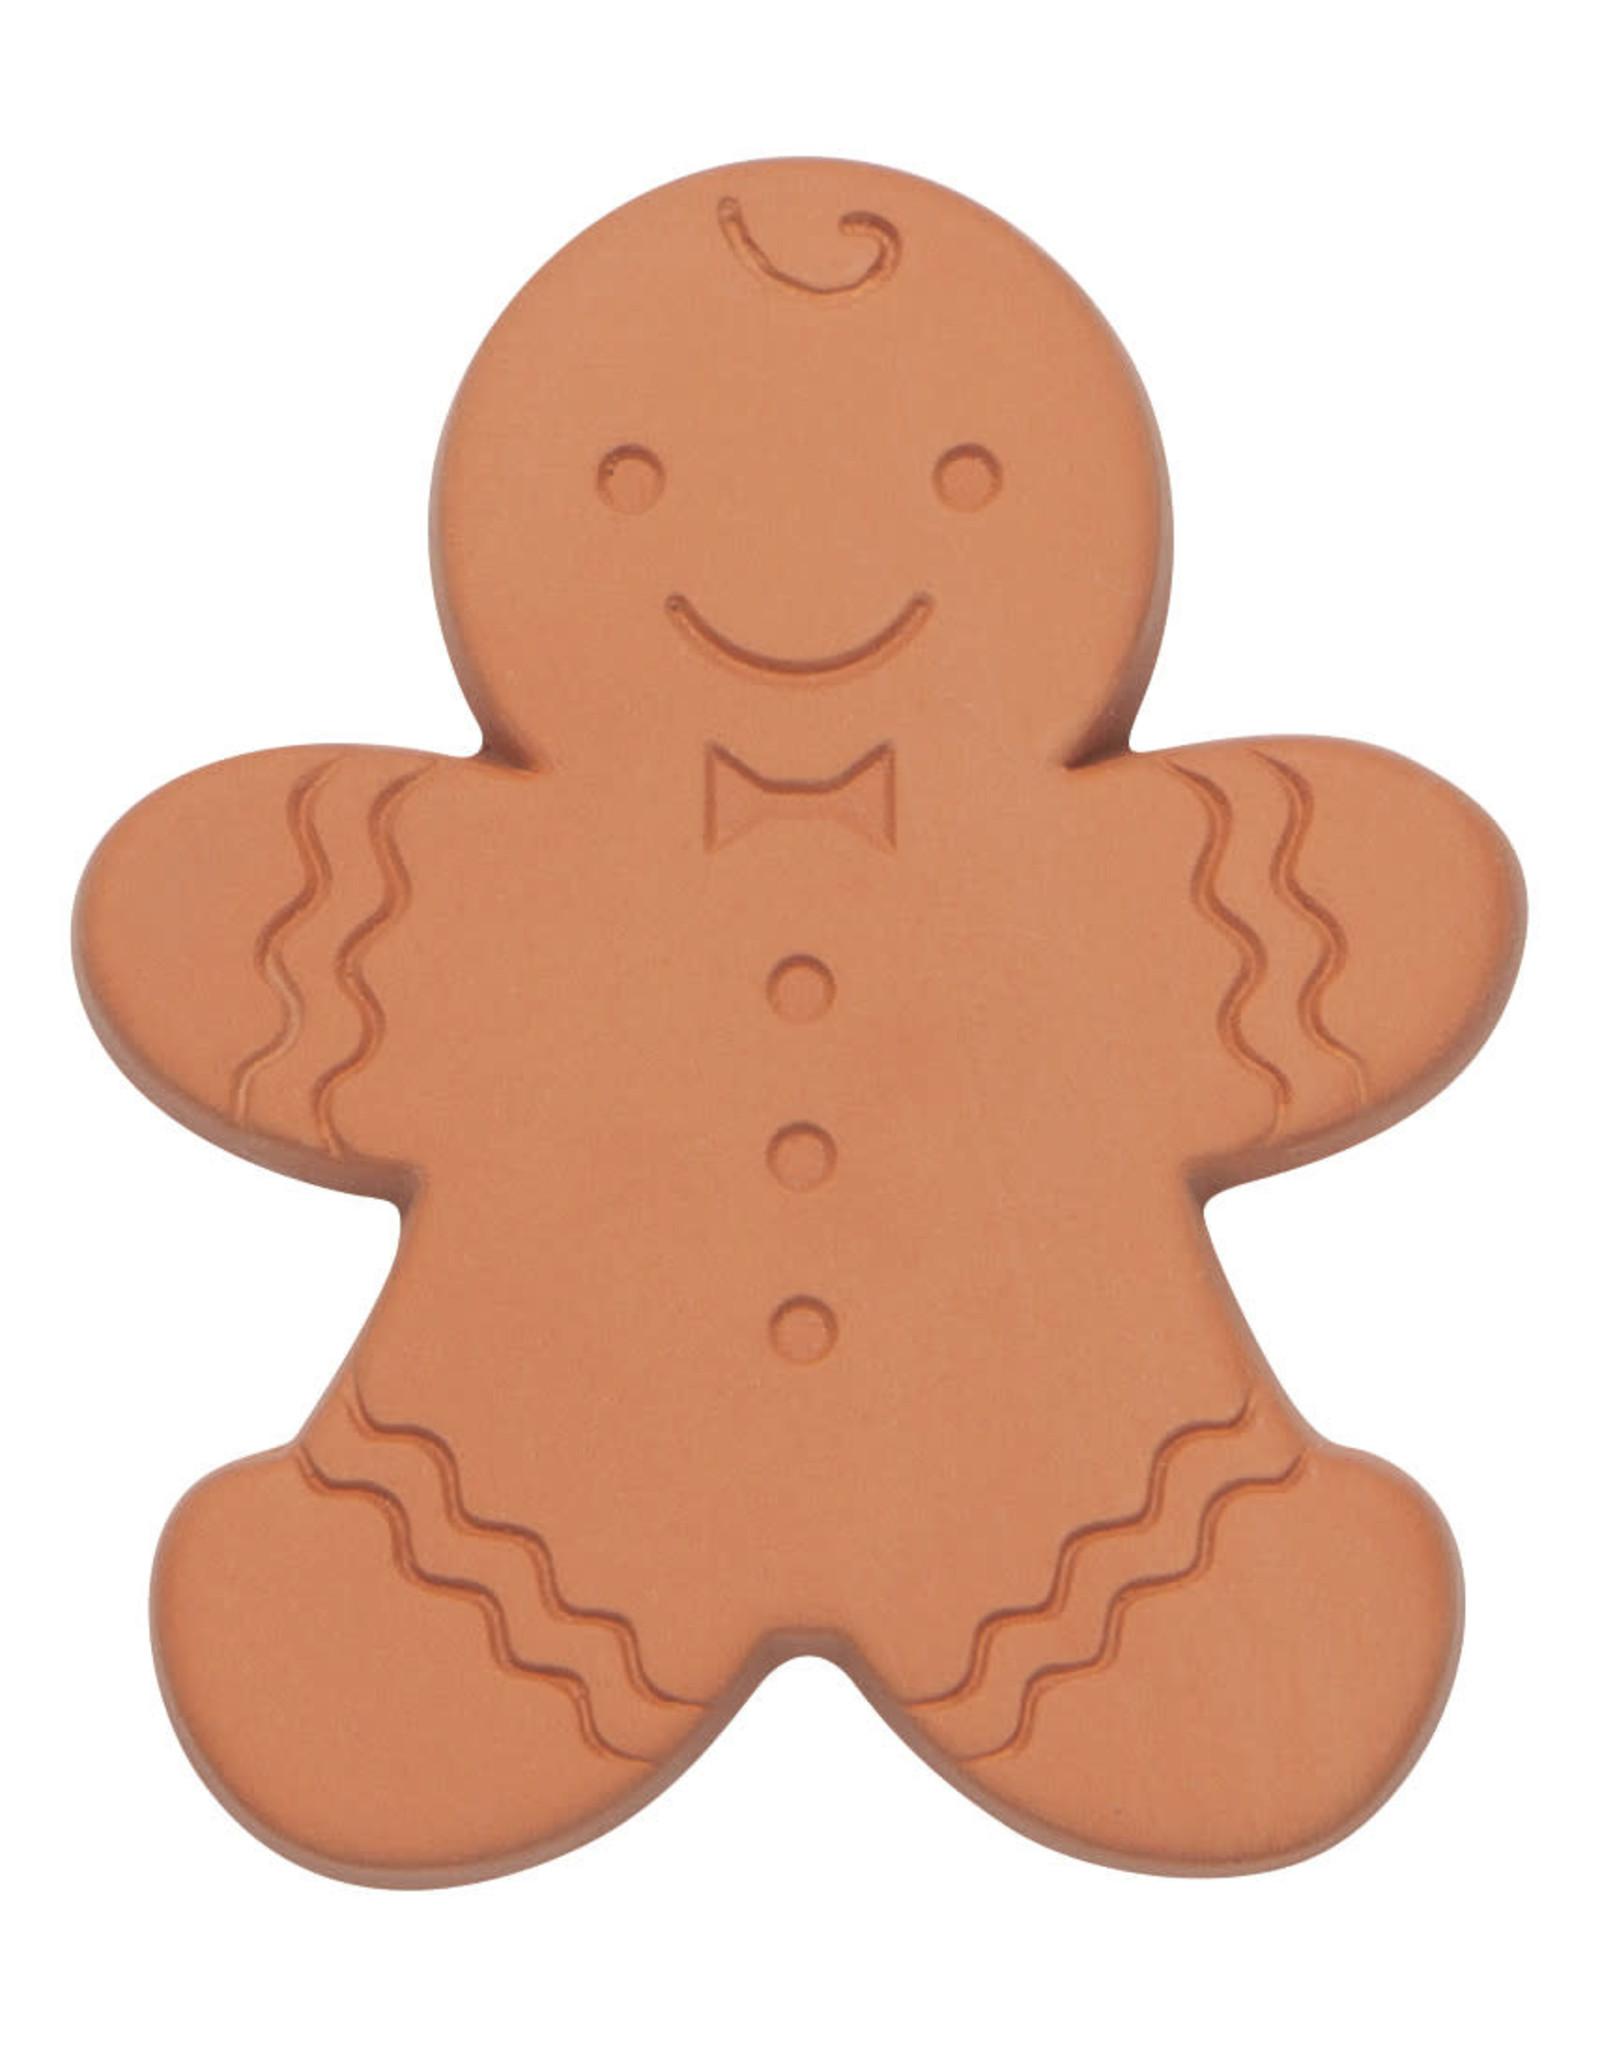 Danica Danica - Sugar Saver Gingerbread